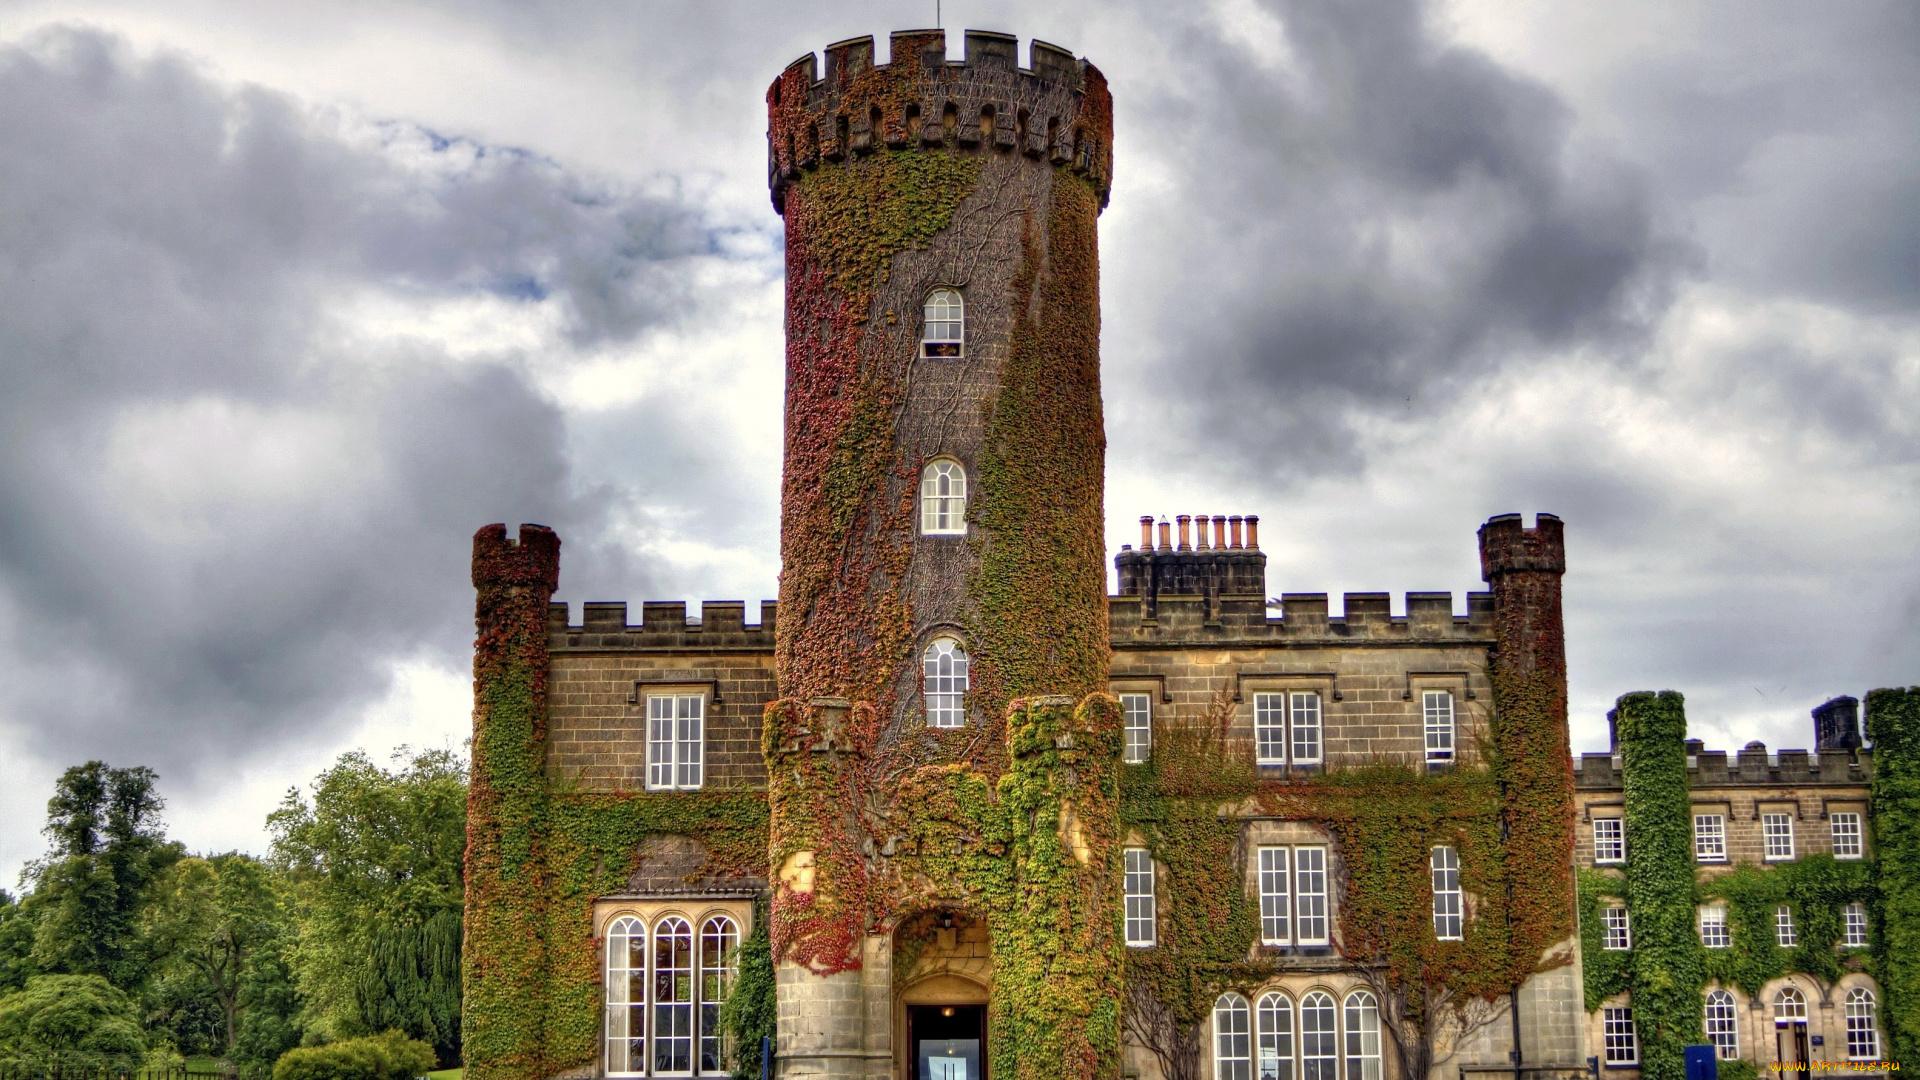 страны архитектура замок country architecture castle онлайн